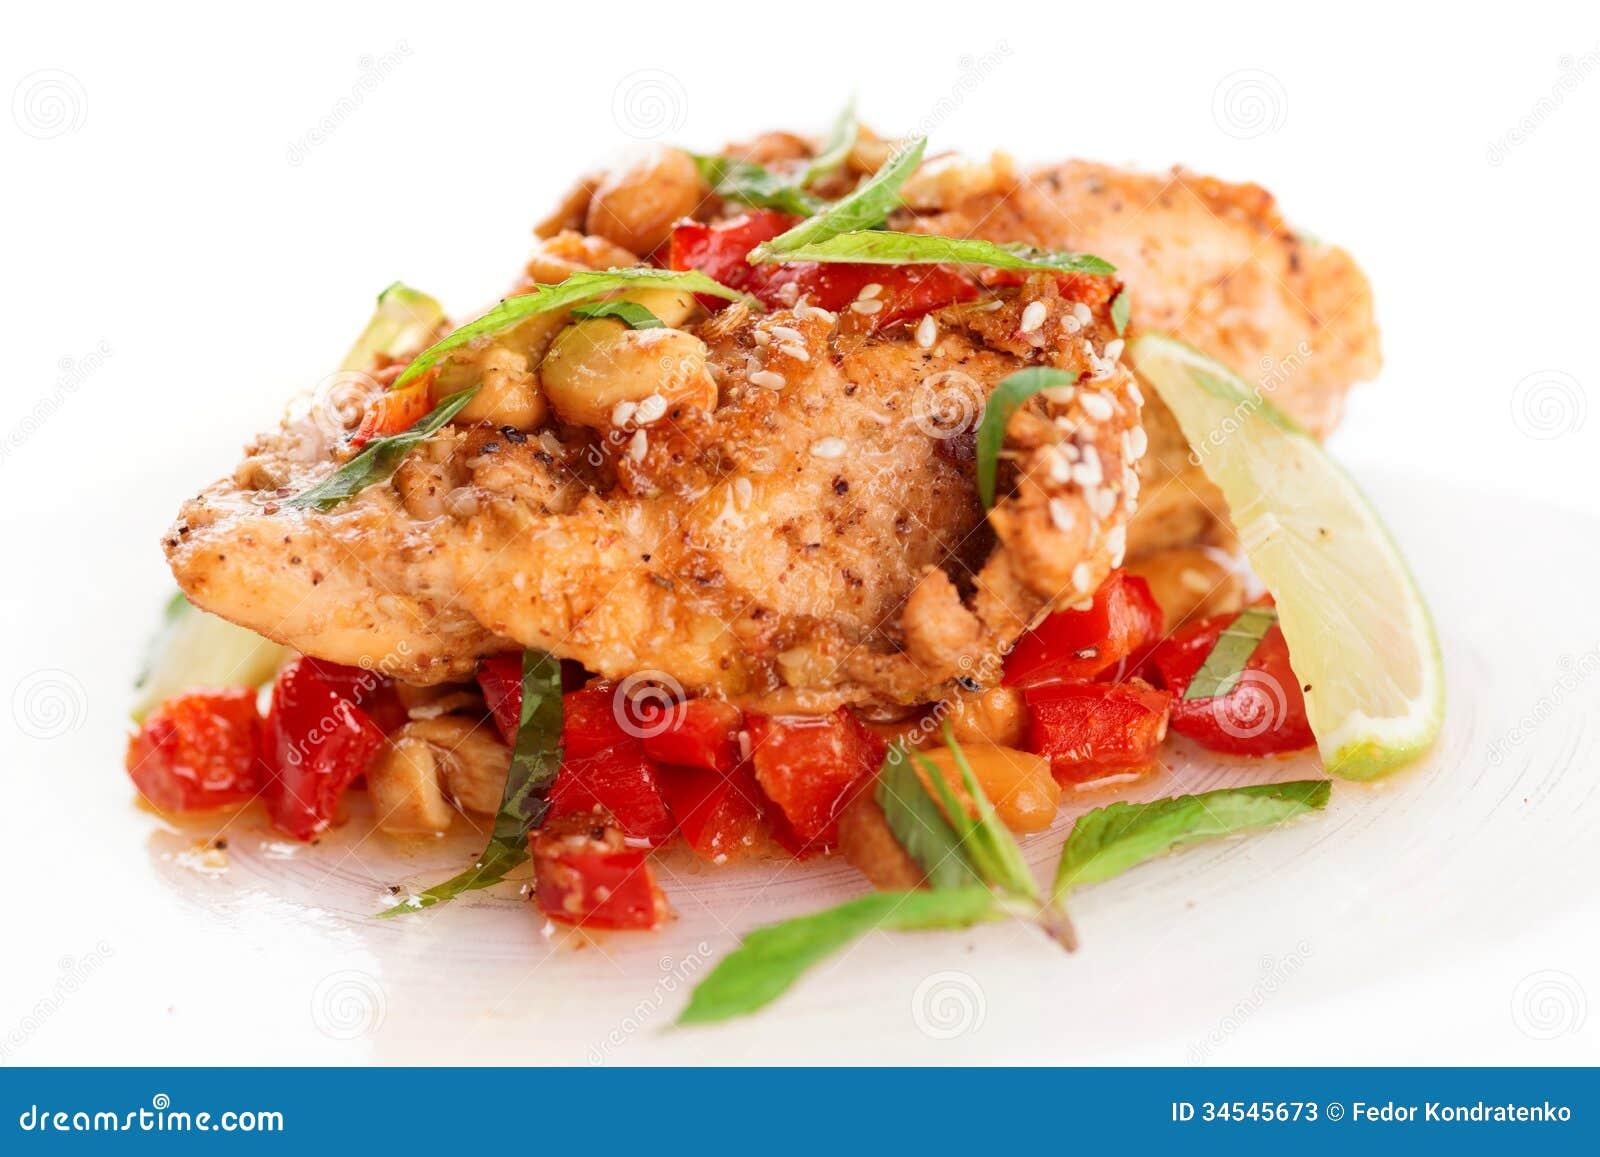 Asian style chicken breast recipe-1106